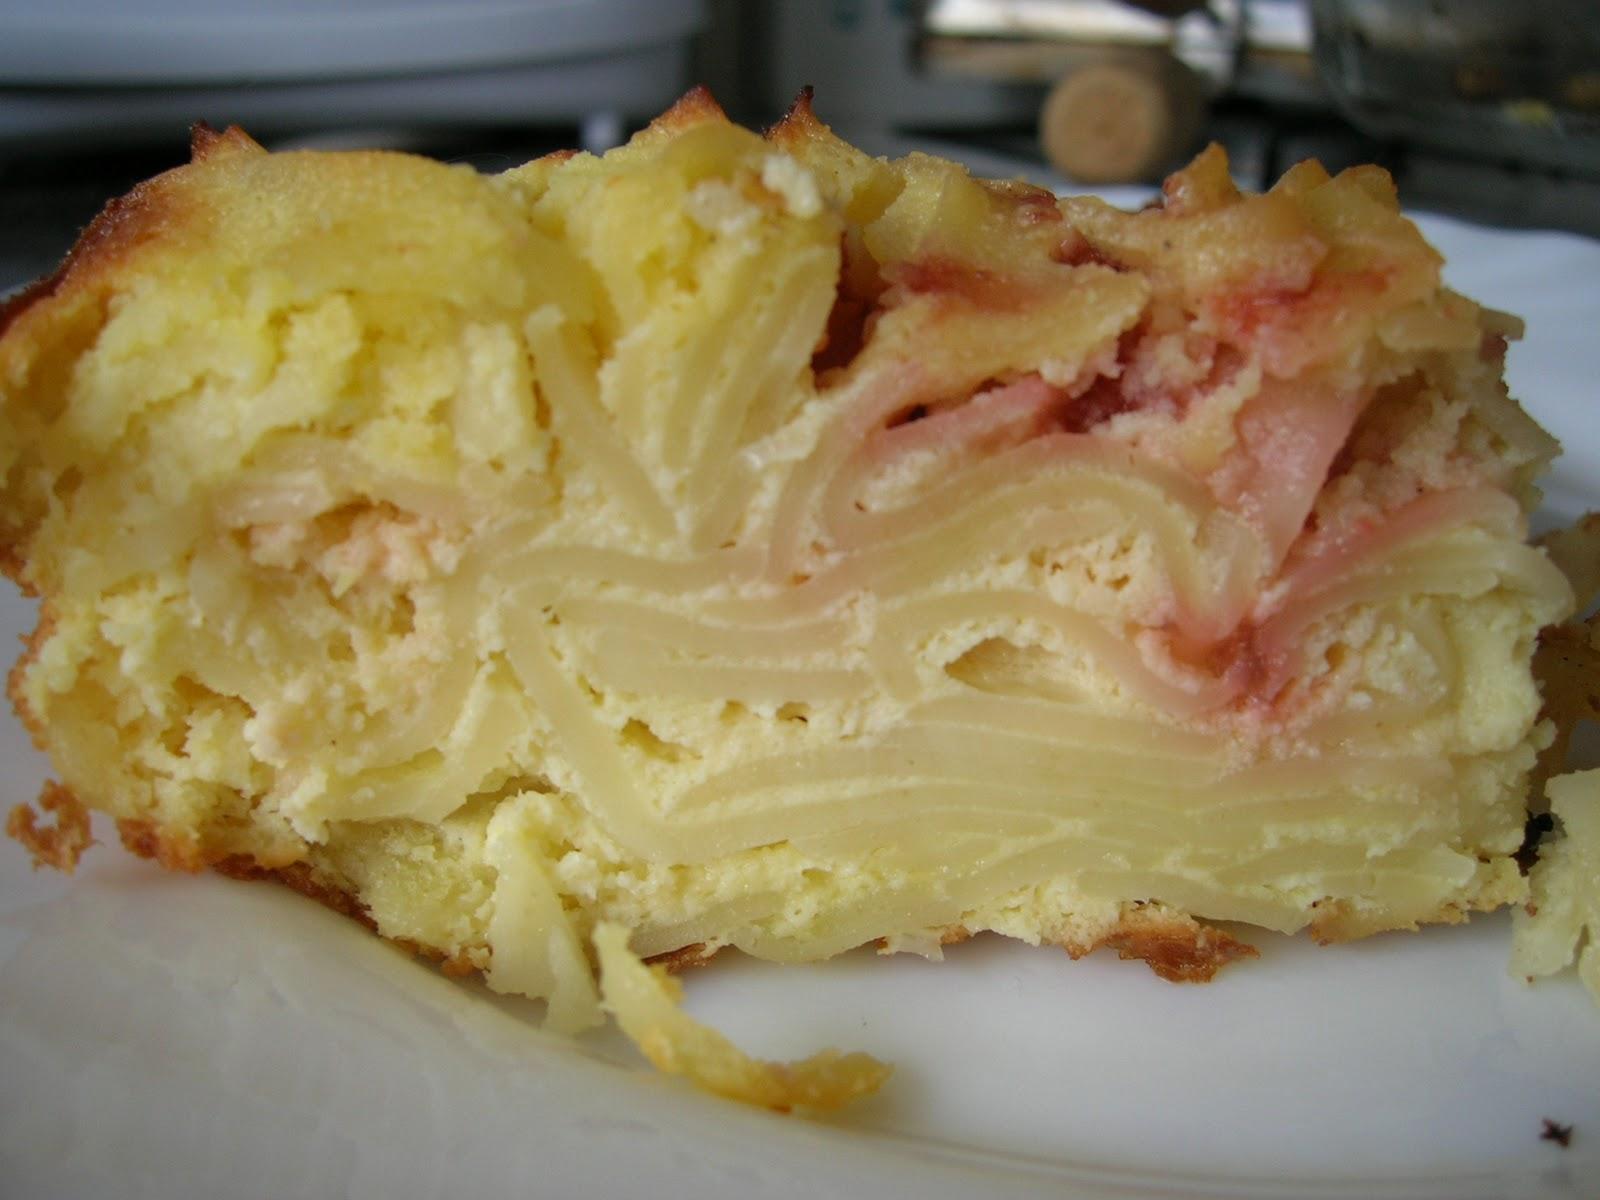 noodle kugel sweet lokshen kugel bubbe s luchen kugel potato kugel ...